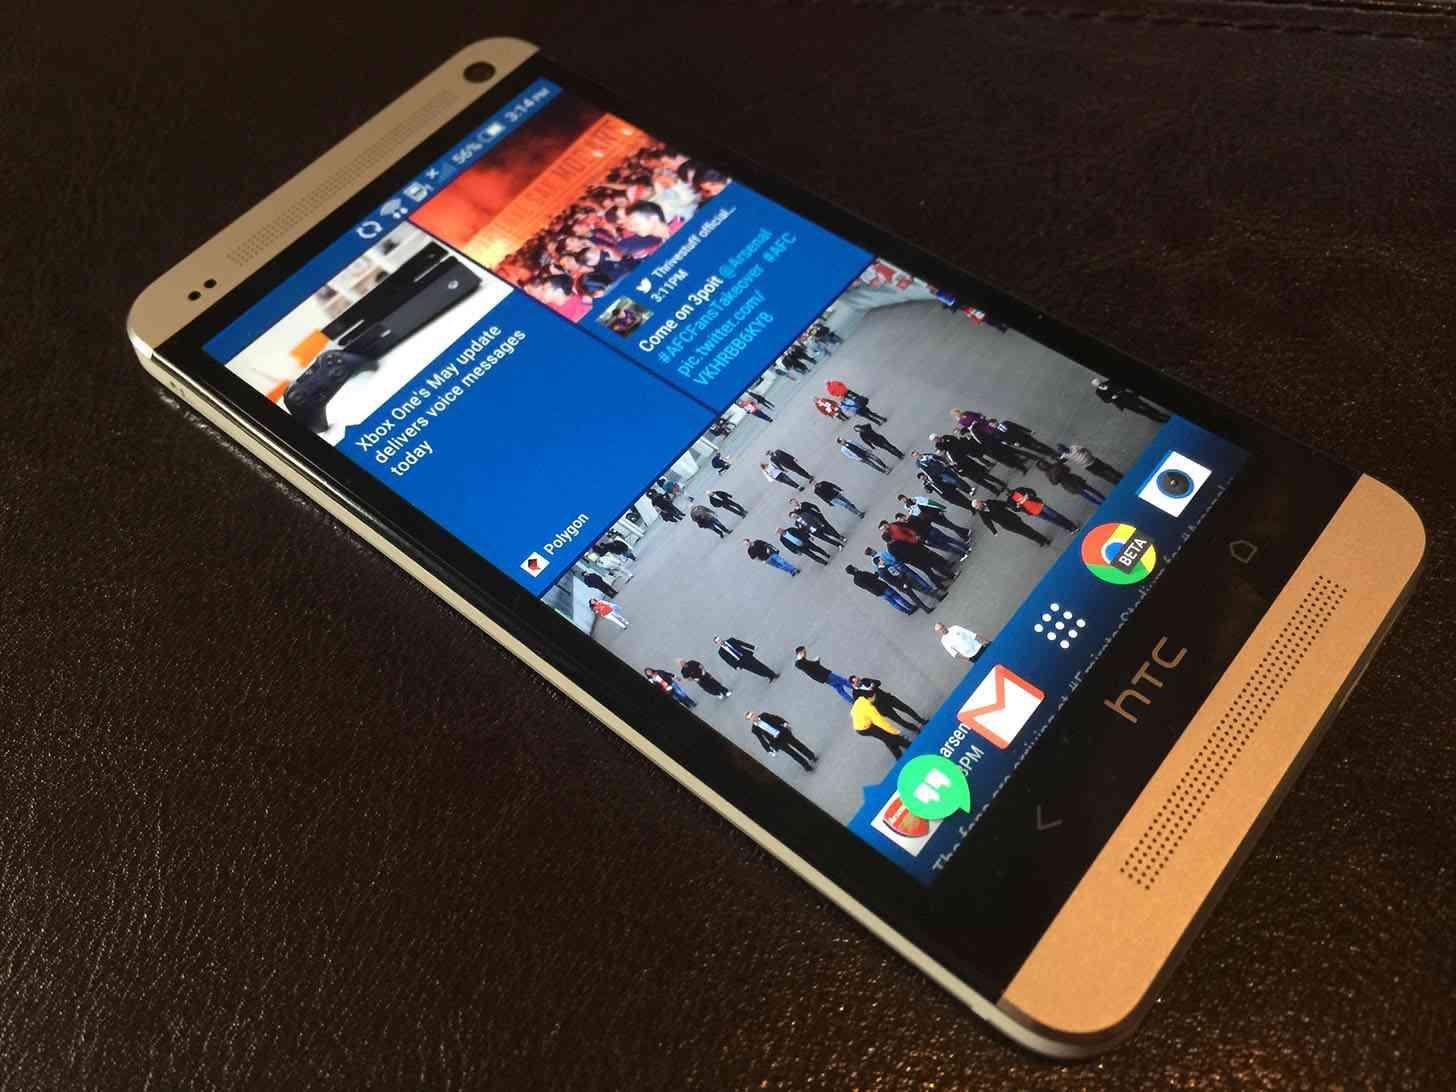 HTC BlinkFeed One M7